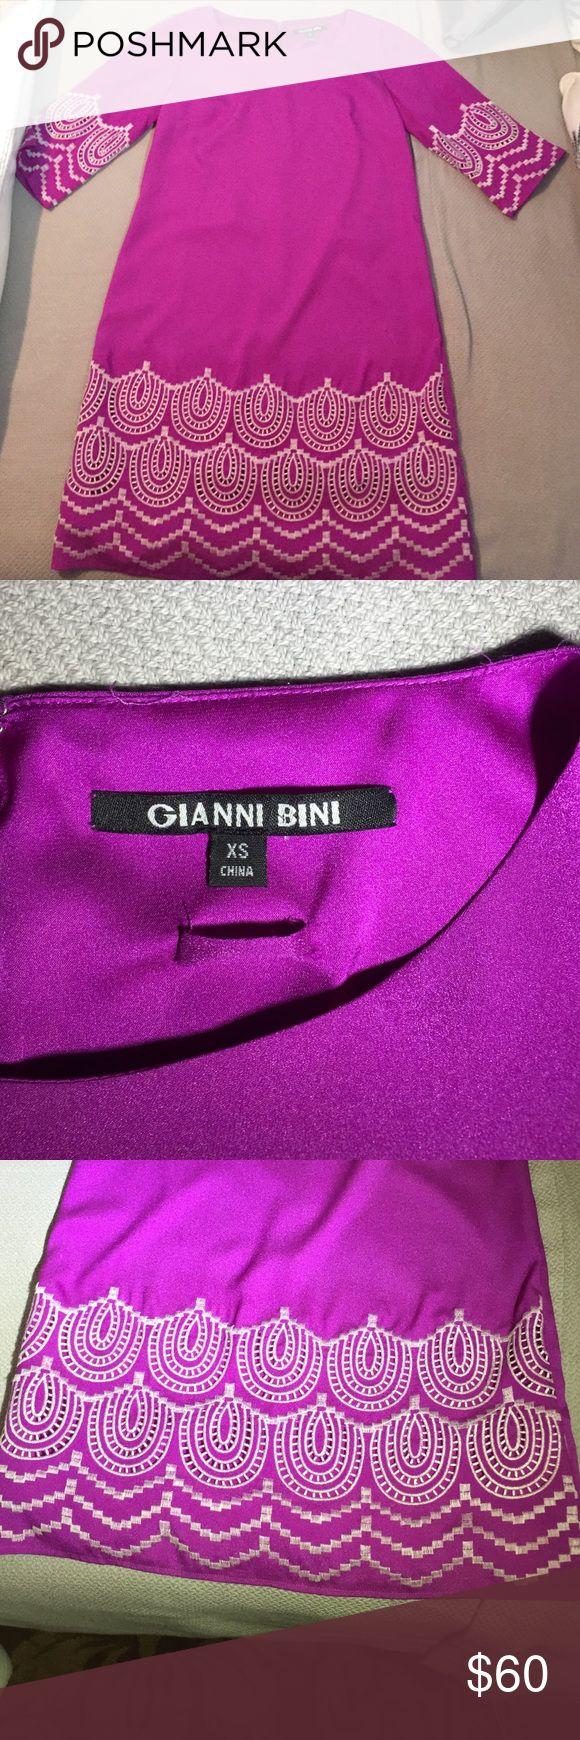 Gianni Bini purple embroidered dress, EUC Gianni Bini Purple embroidered dress, EUC Gianni Bini Dresses